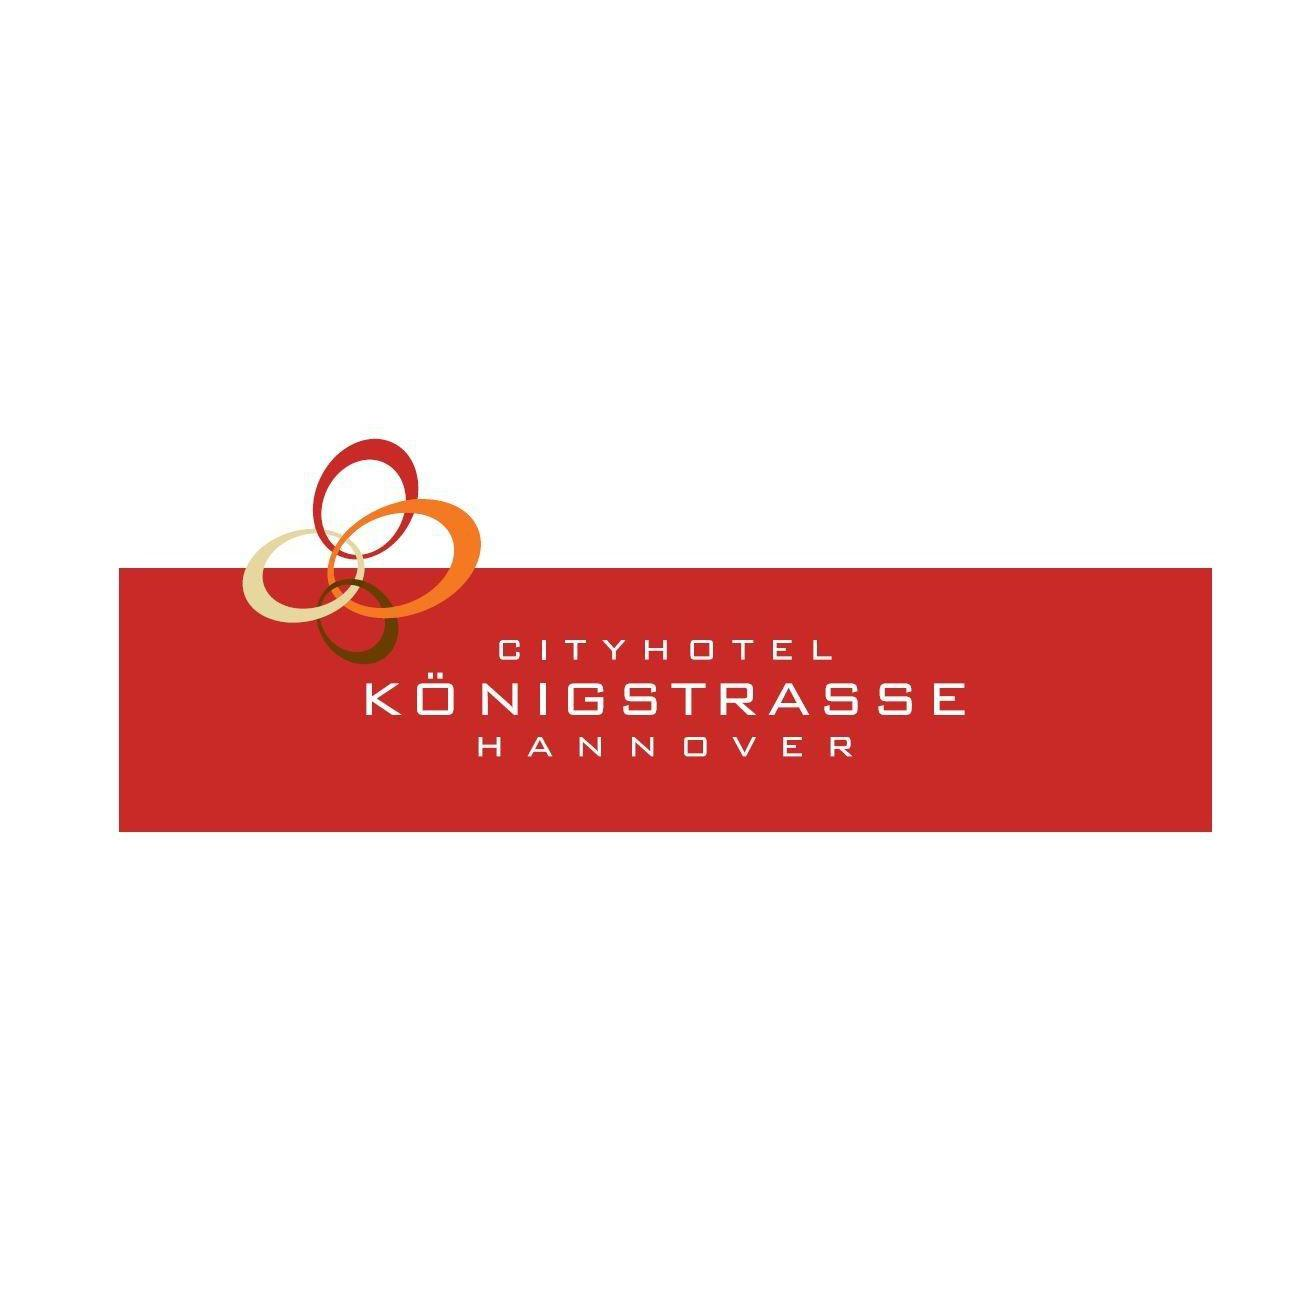 Cityhotel Königstrasse in Hannover